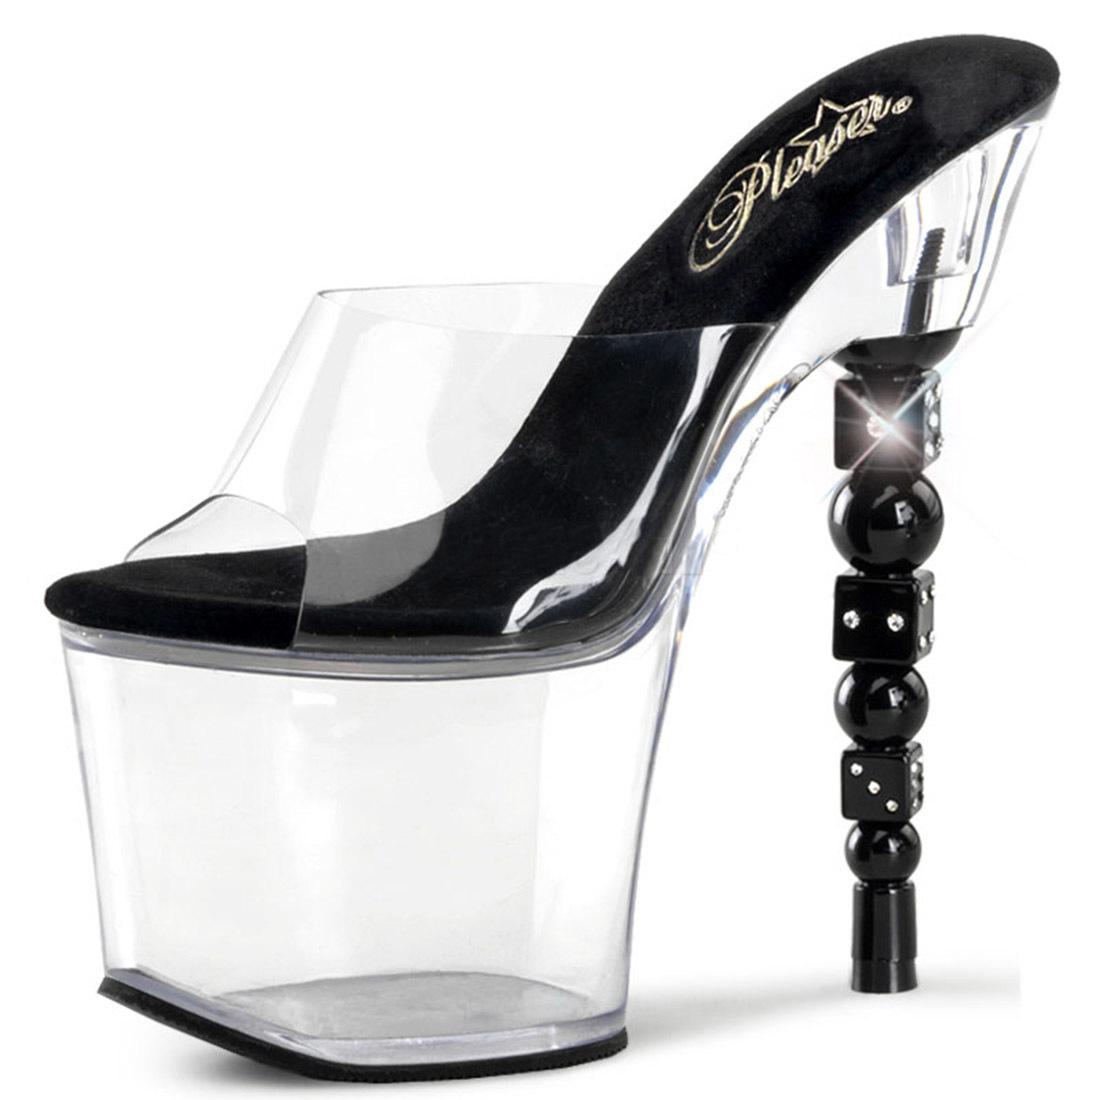 Clear Platform Slide Sandals with Black Dice Shaped 7 Inch Heels